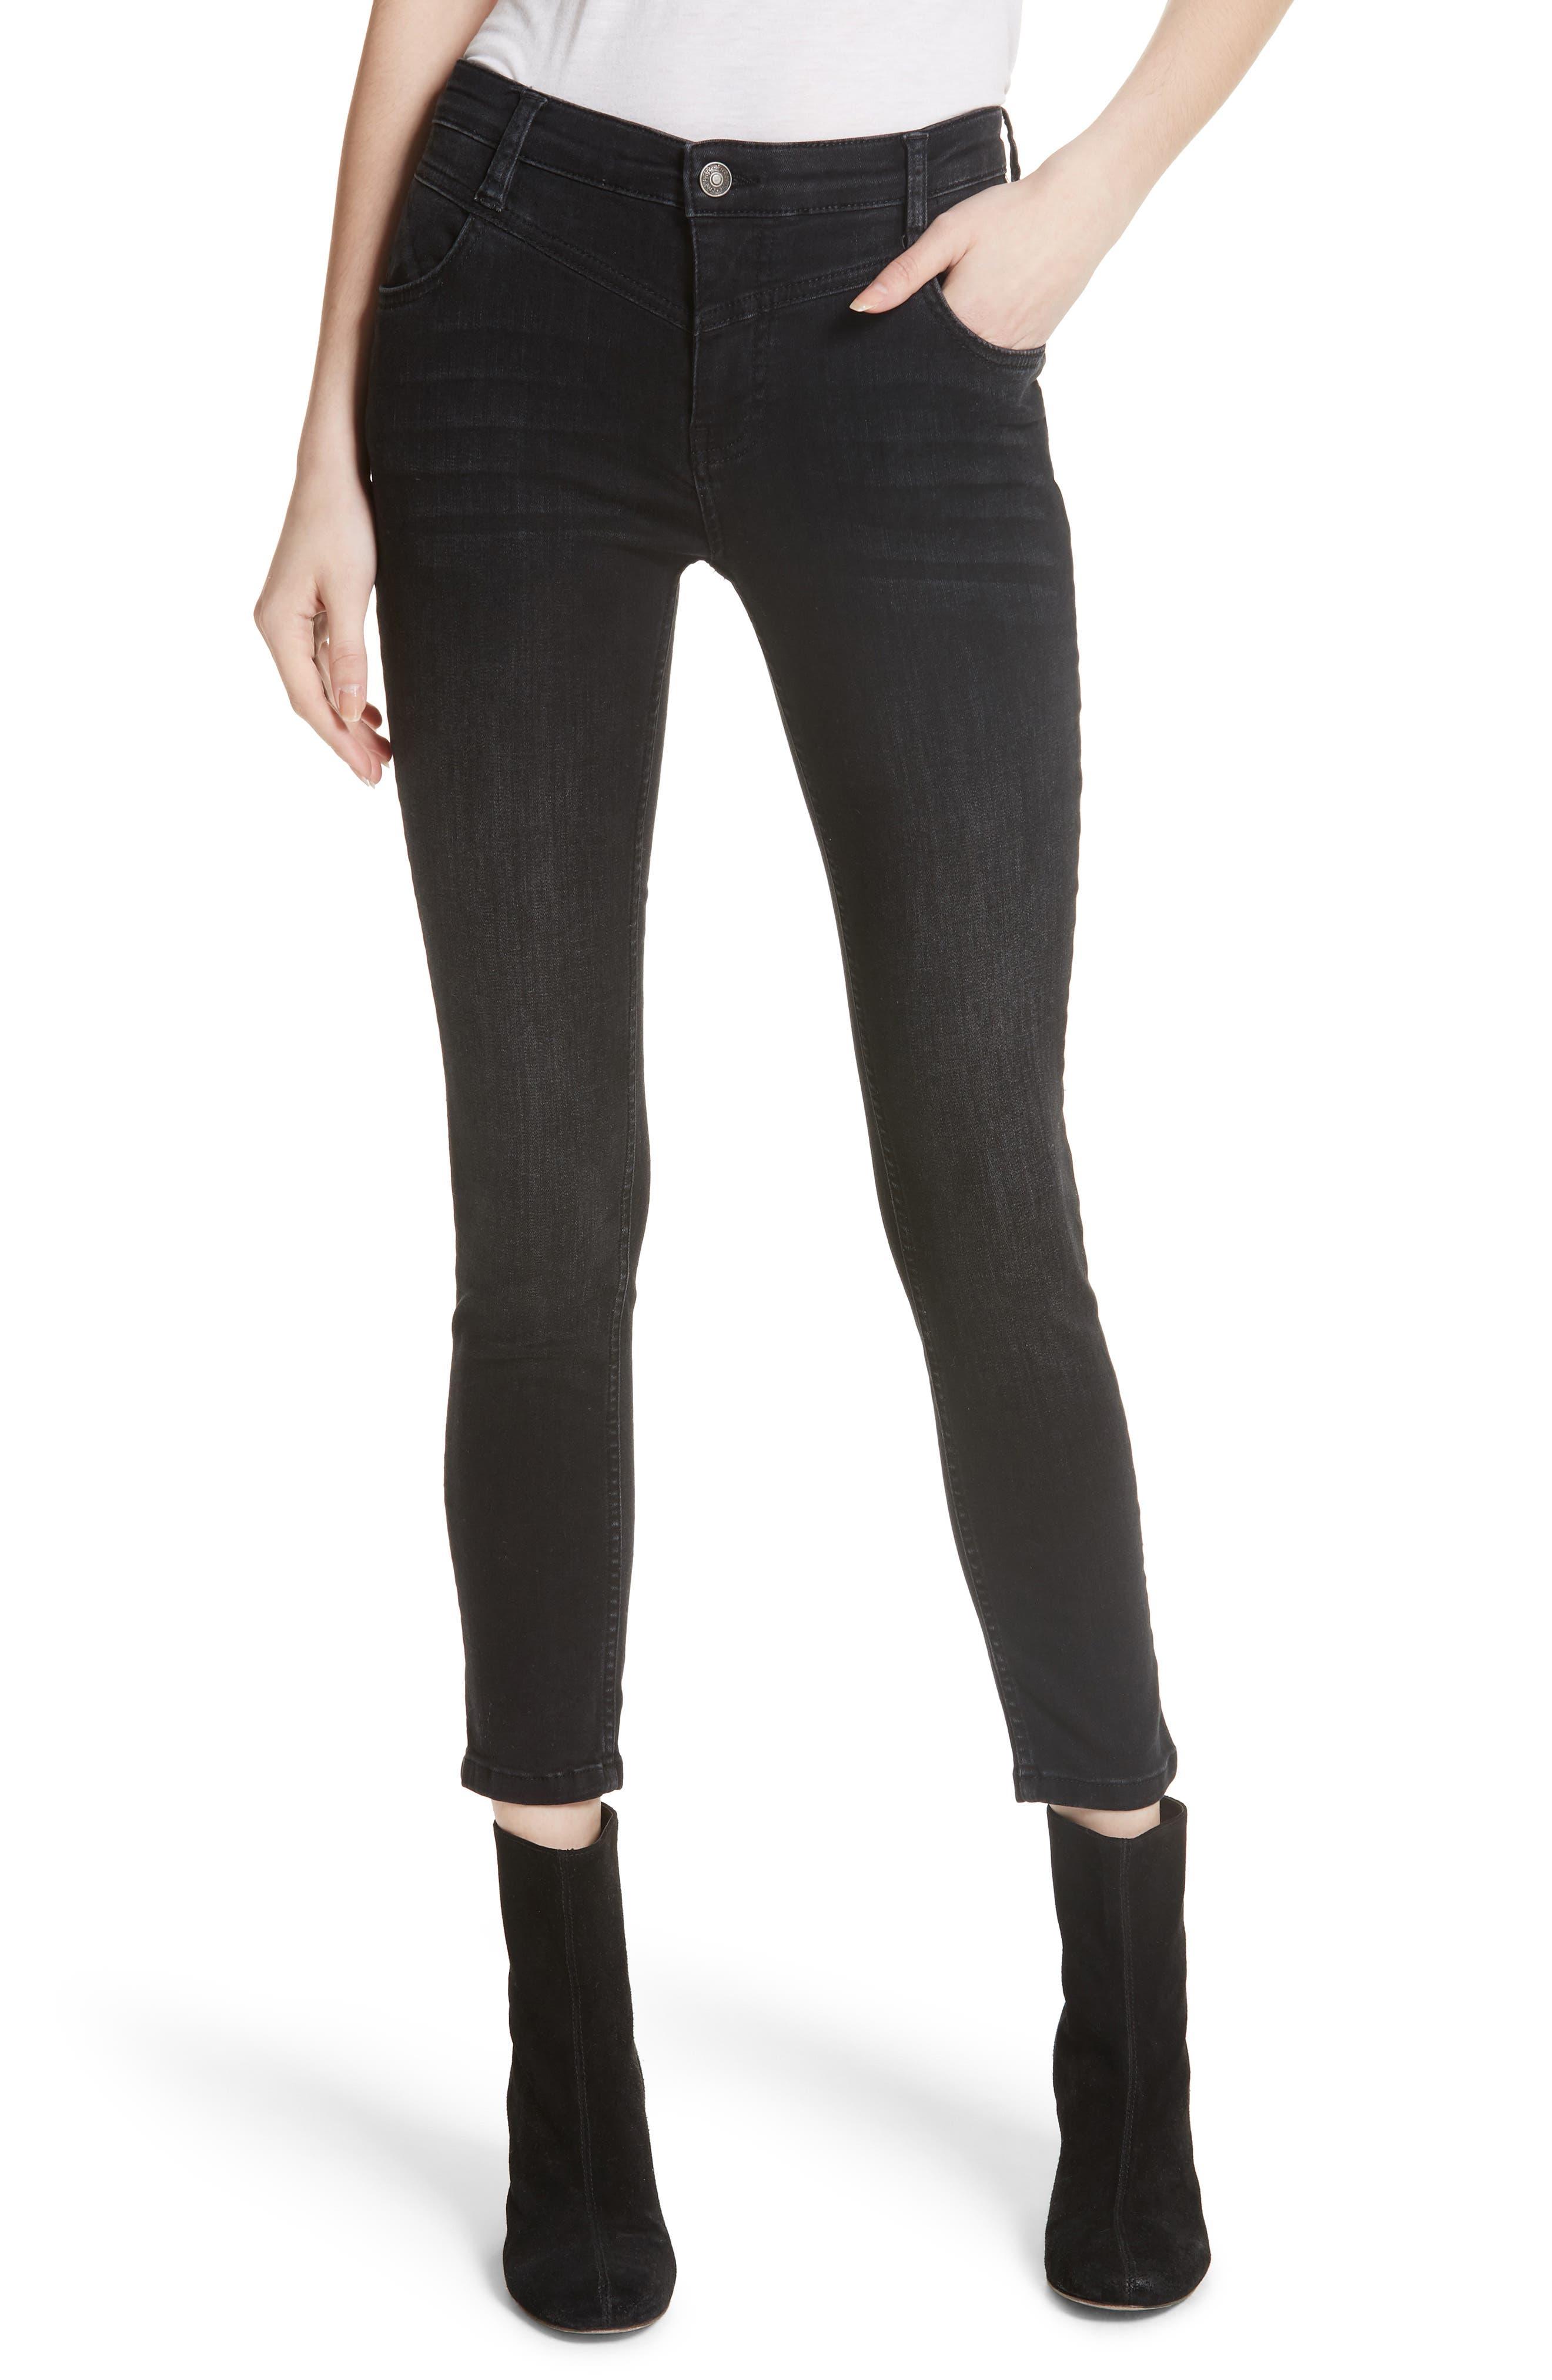 Mara Skinny Jeans,                             Main thumbnail 1, color,